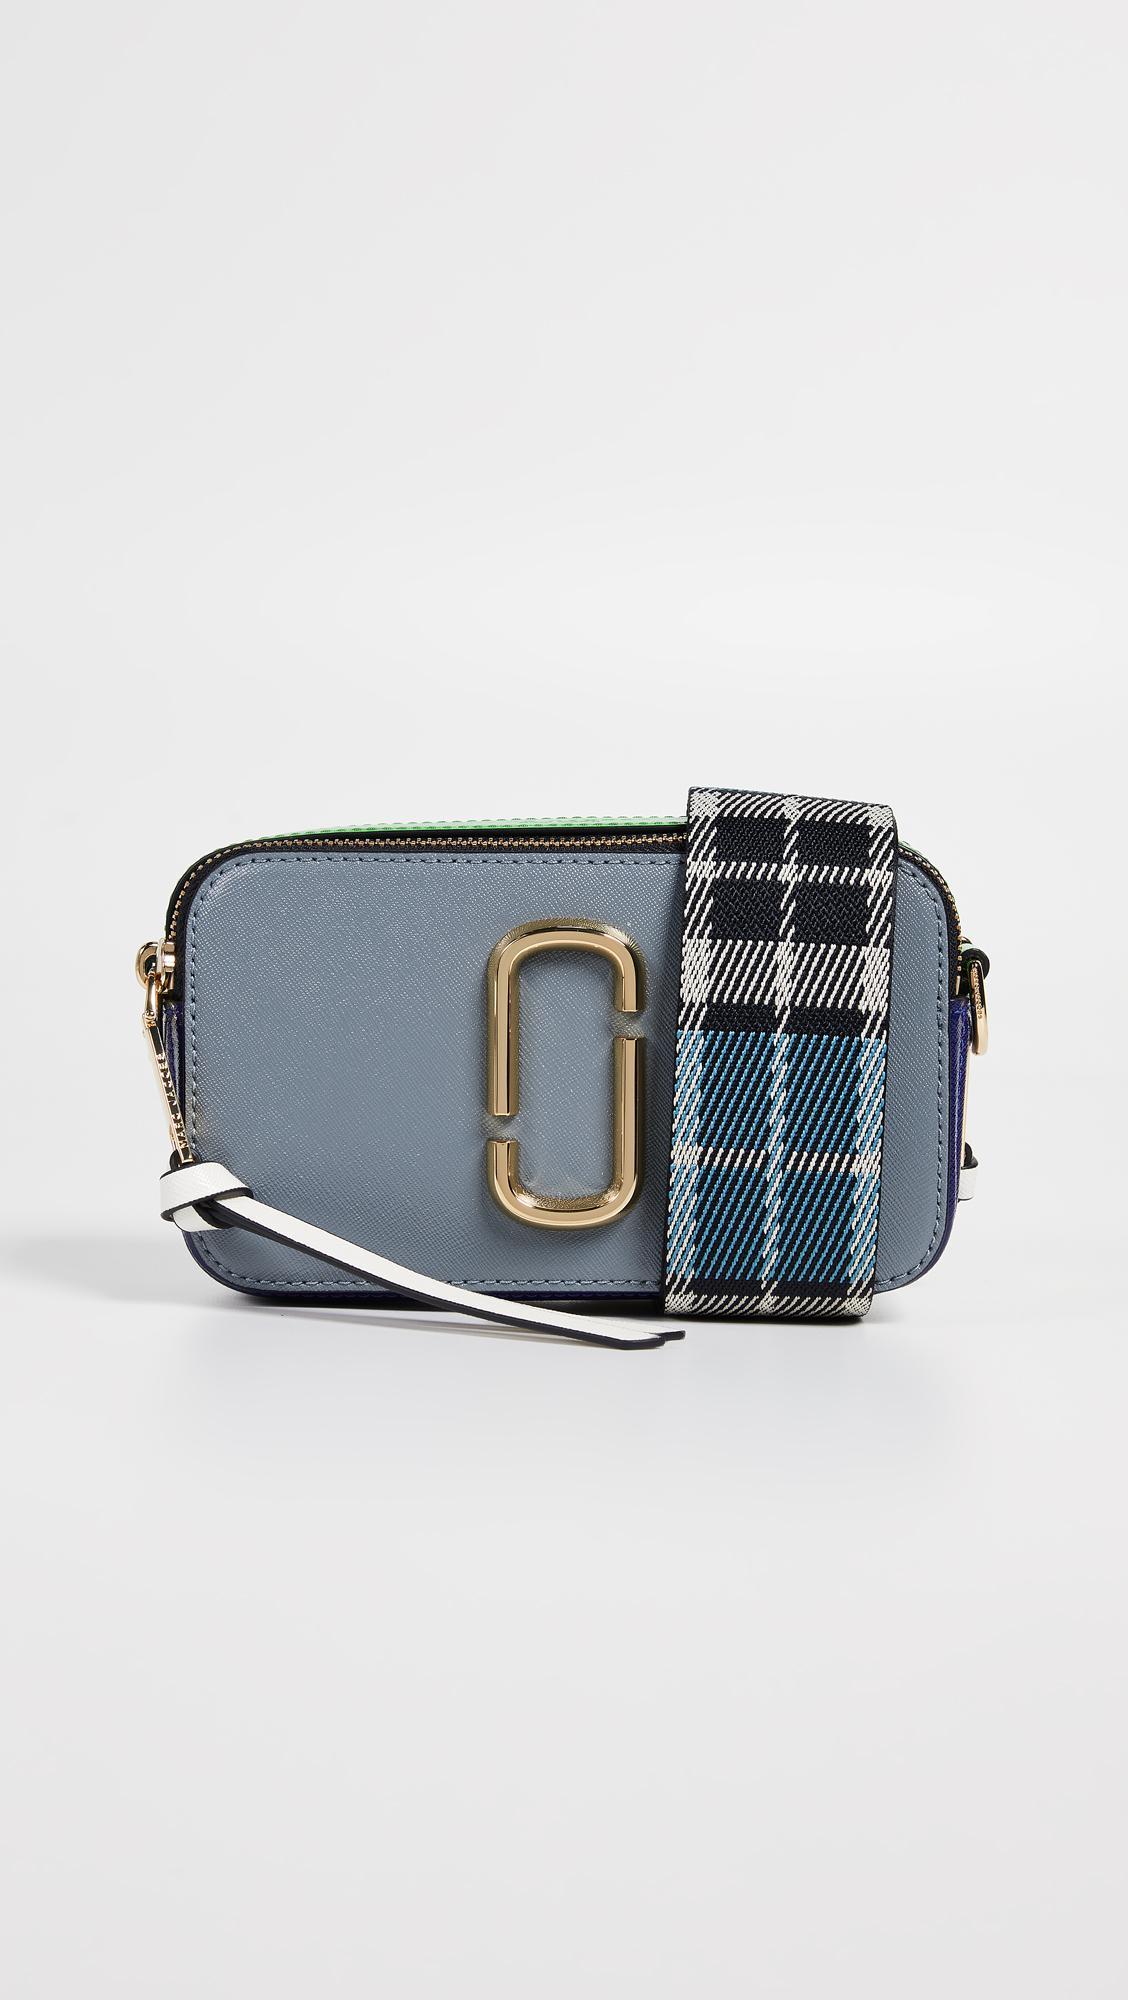 95d609ad09d3e Marc Jacobs. Women s Snapshot Camera Bag